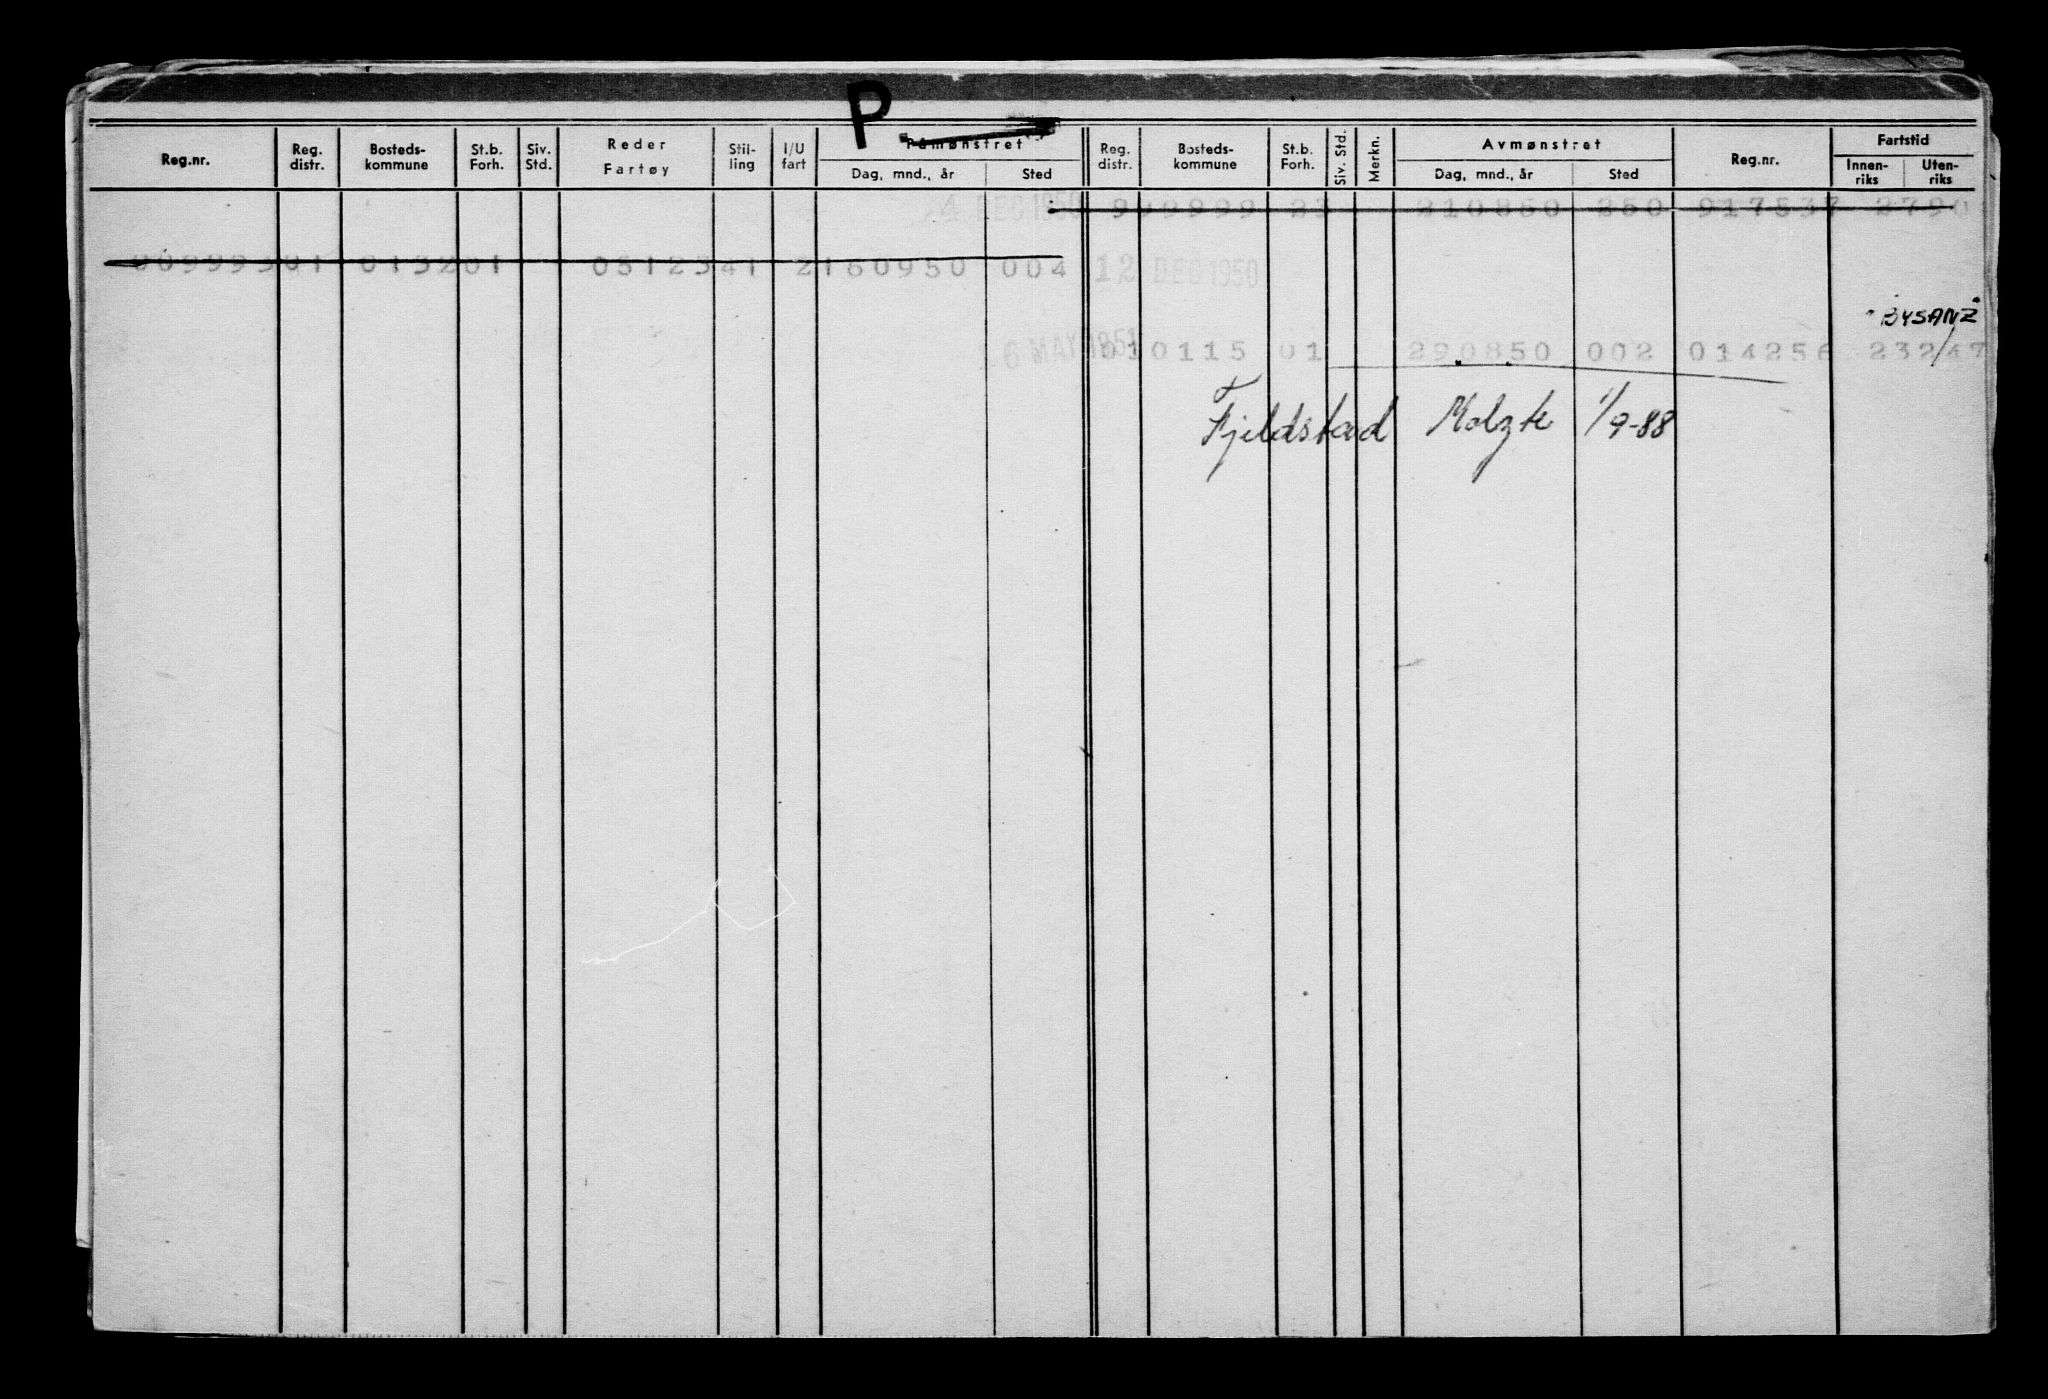 RA, Direktoratet for sjømenn, G/Gb/L0005: Hovedkort, 1888, p. 369